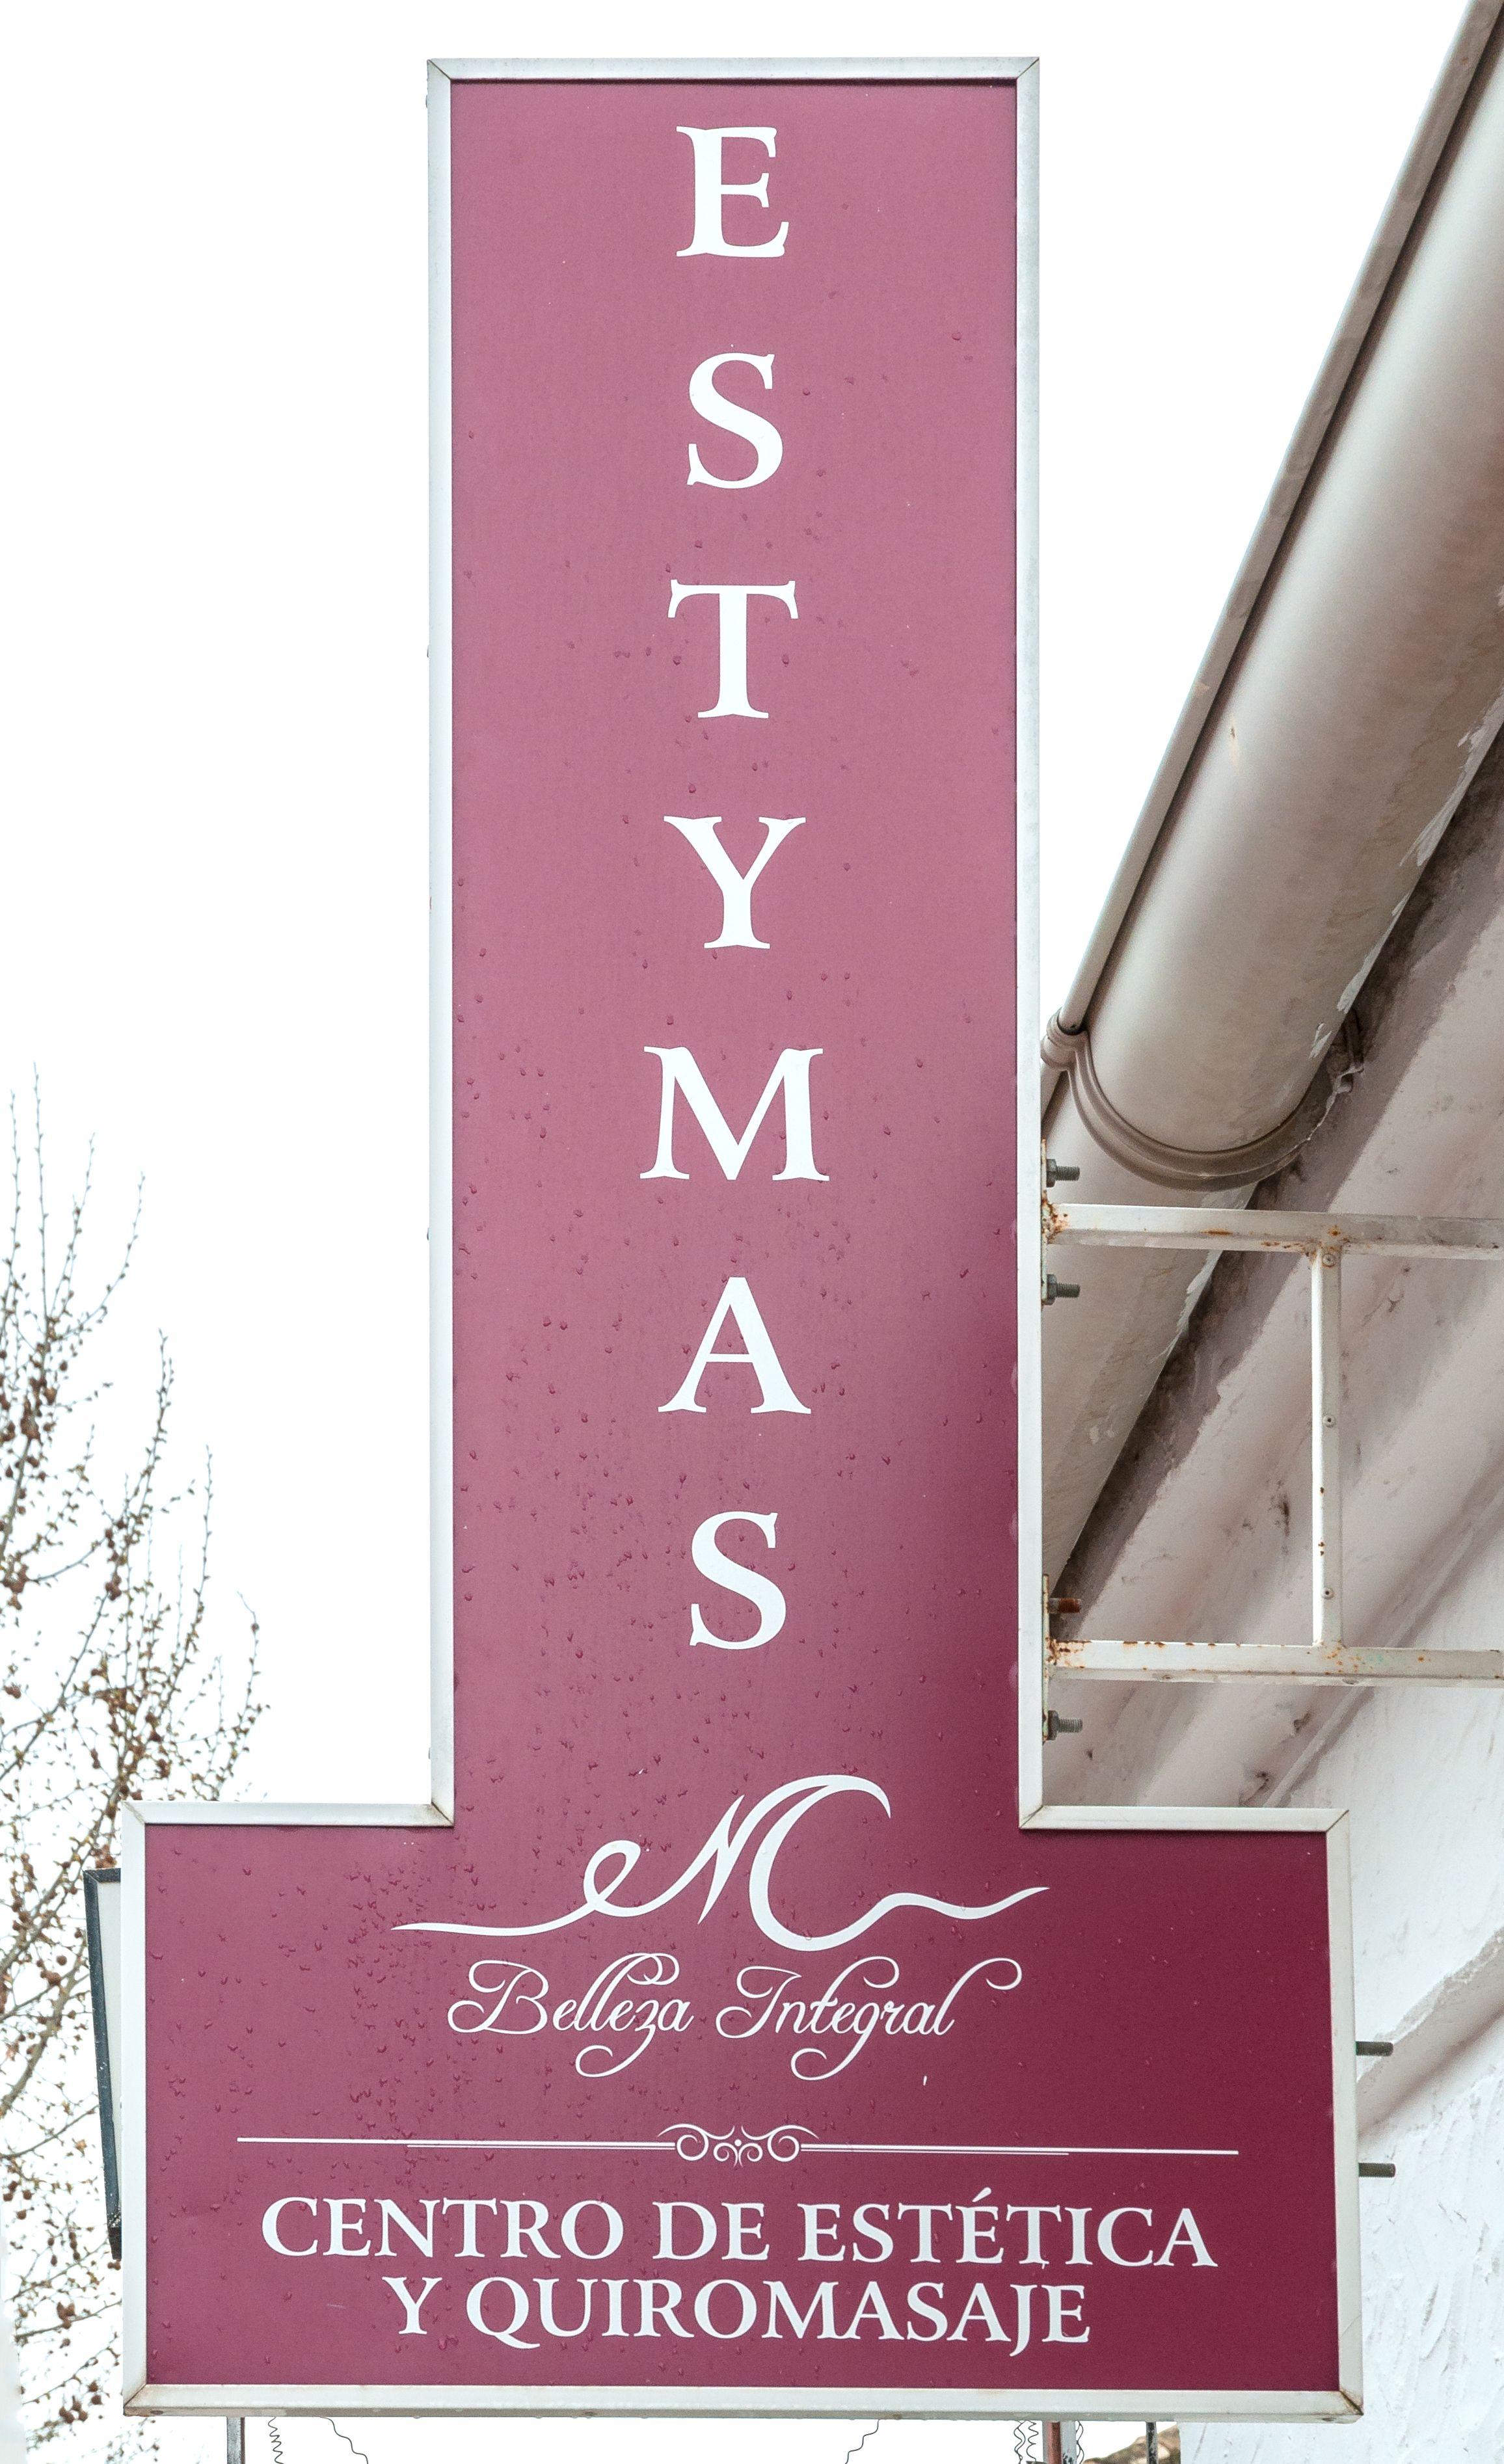 Foto 1 de Centros de estética en Dos Hermanas | Estymas